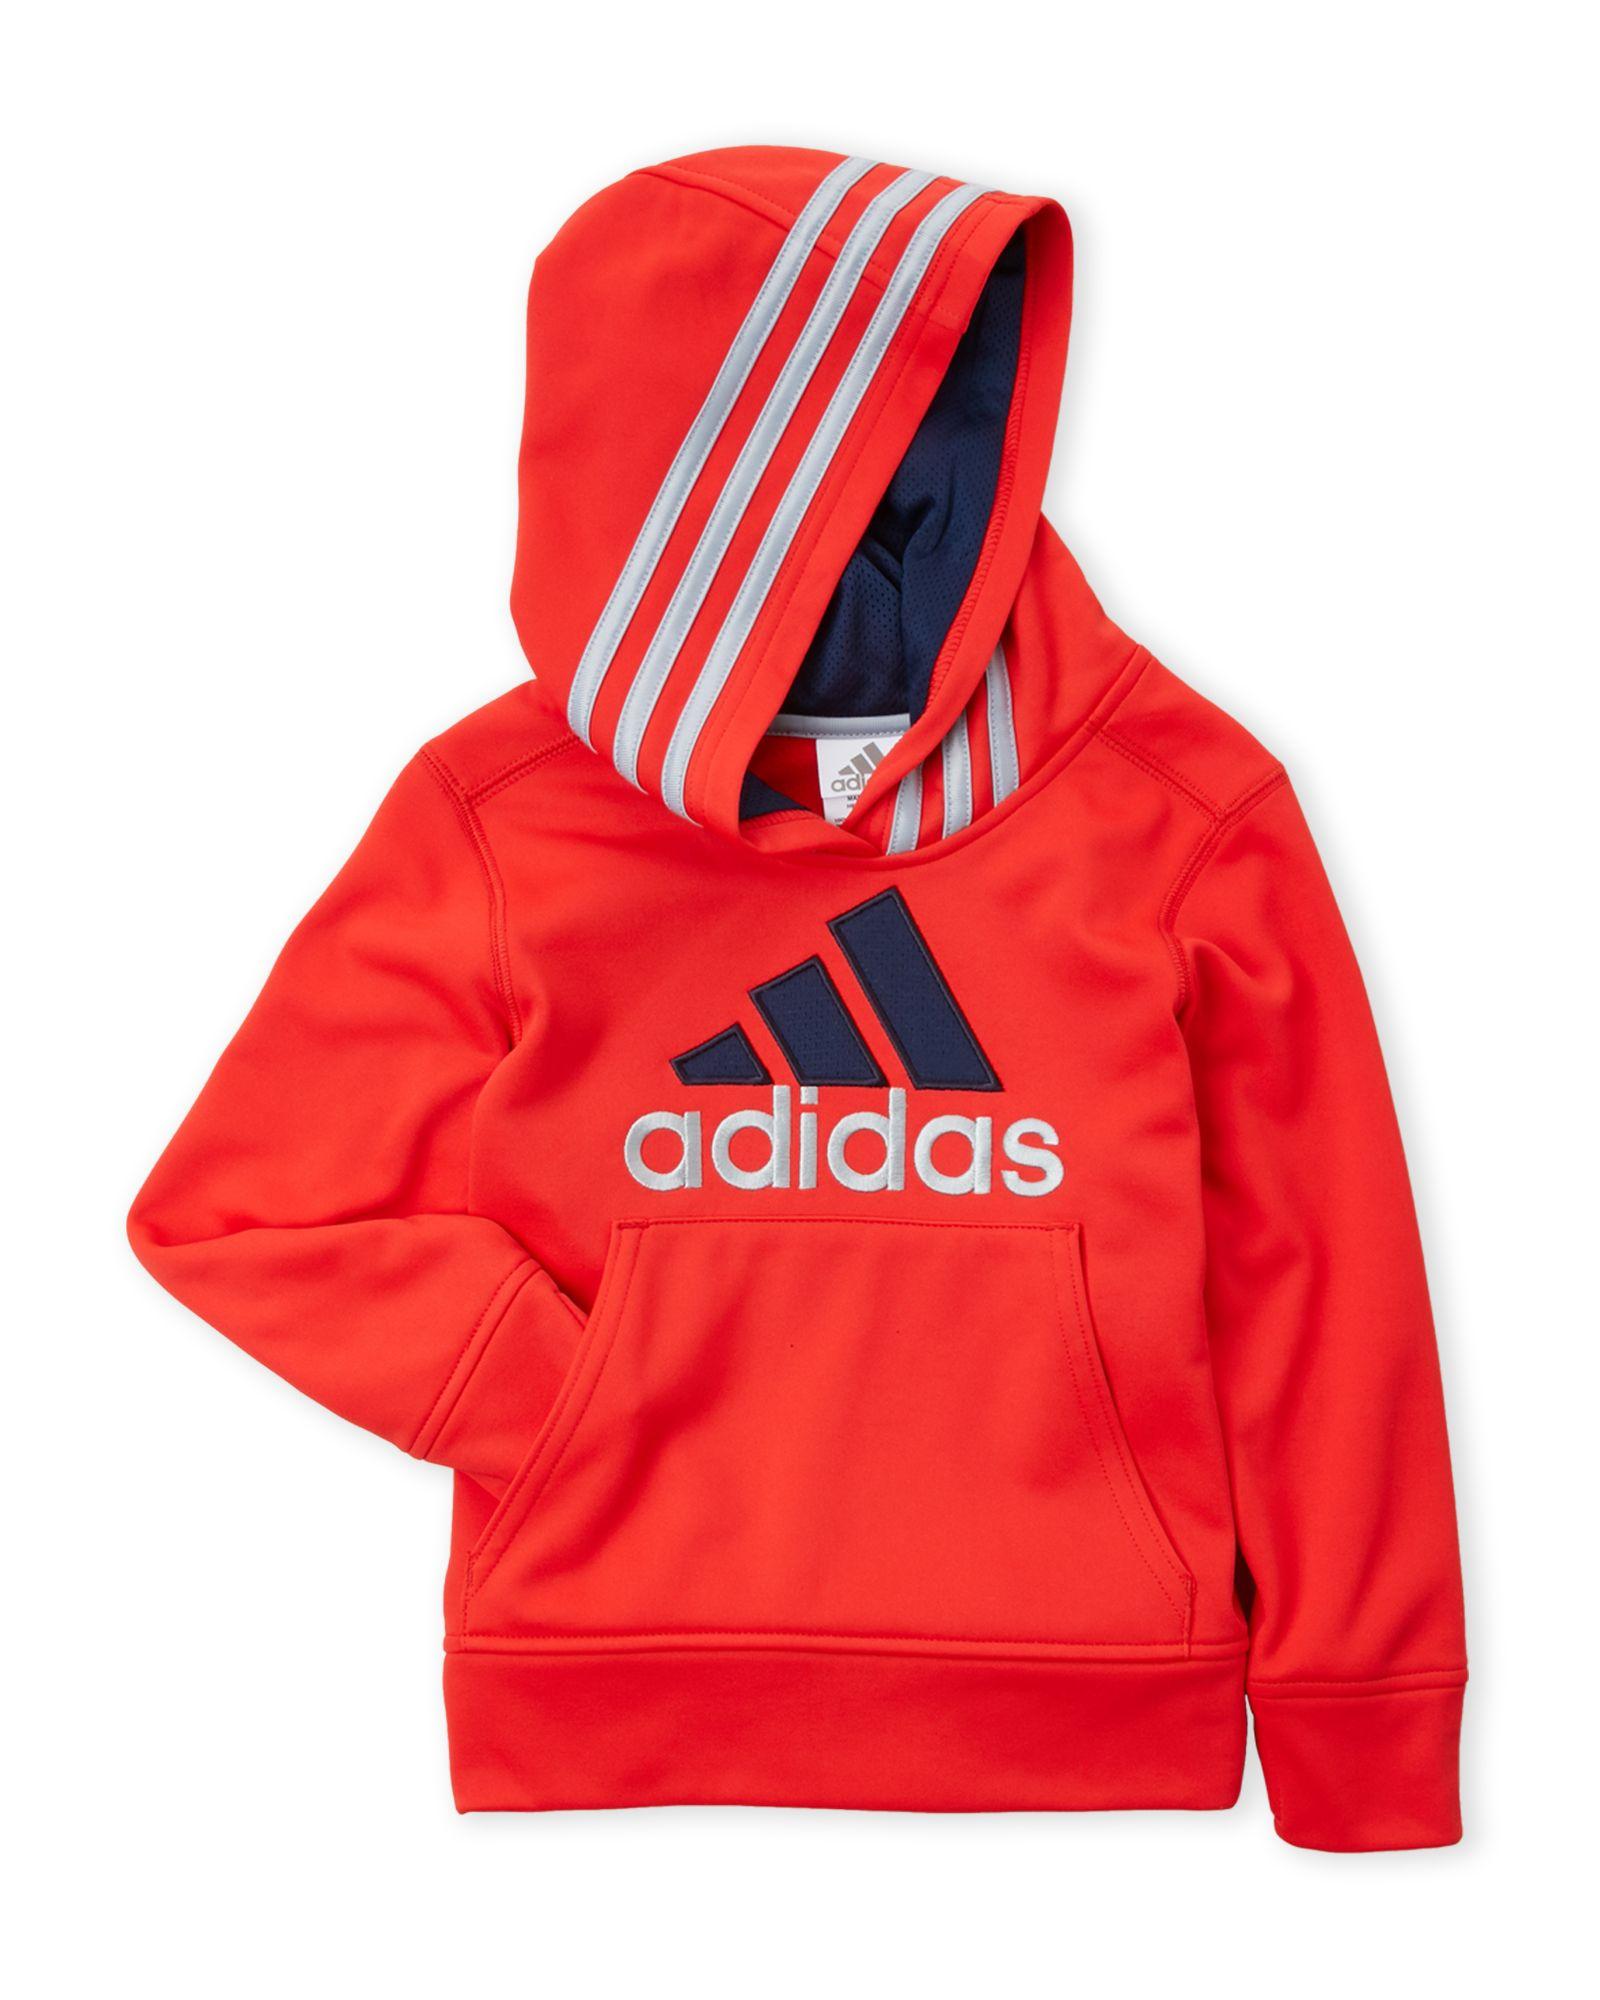 Adidas Toddler Boys Classic Logo Fleece Hoodie Ropa De Hombre Ropa Adidas Sudaderas Adidas Hombre [ 2000 x 1600 Pixel ]